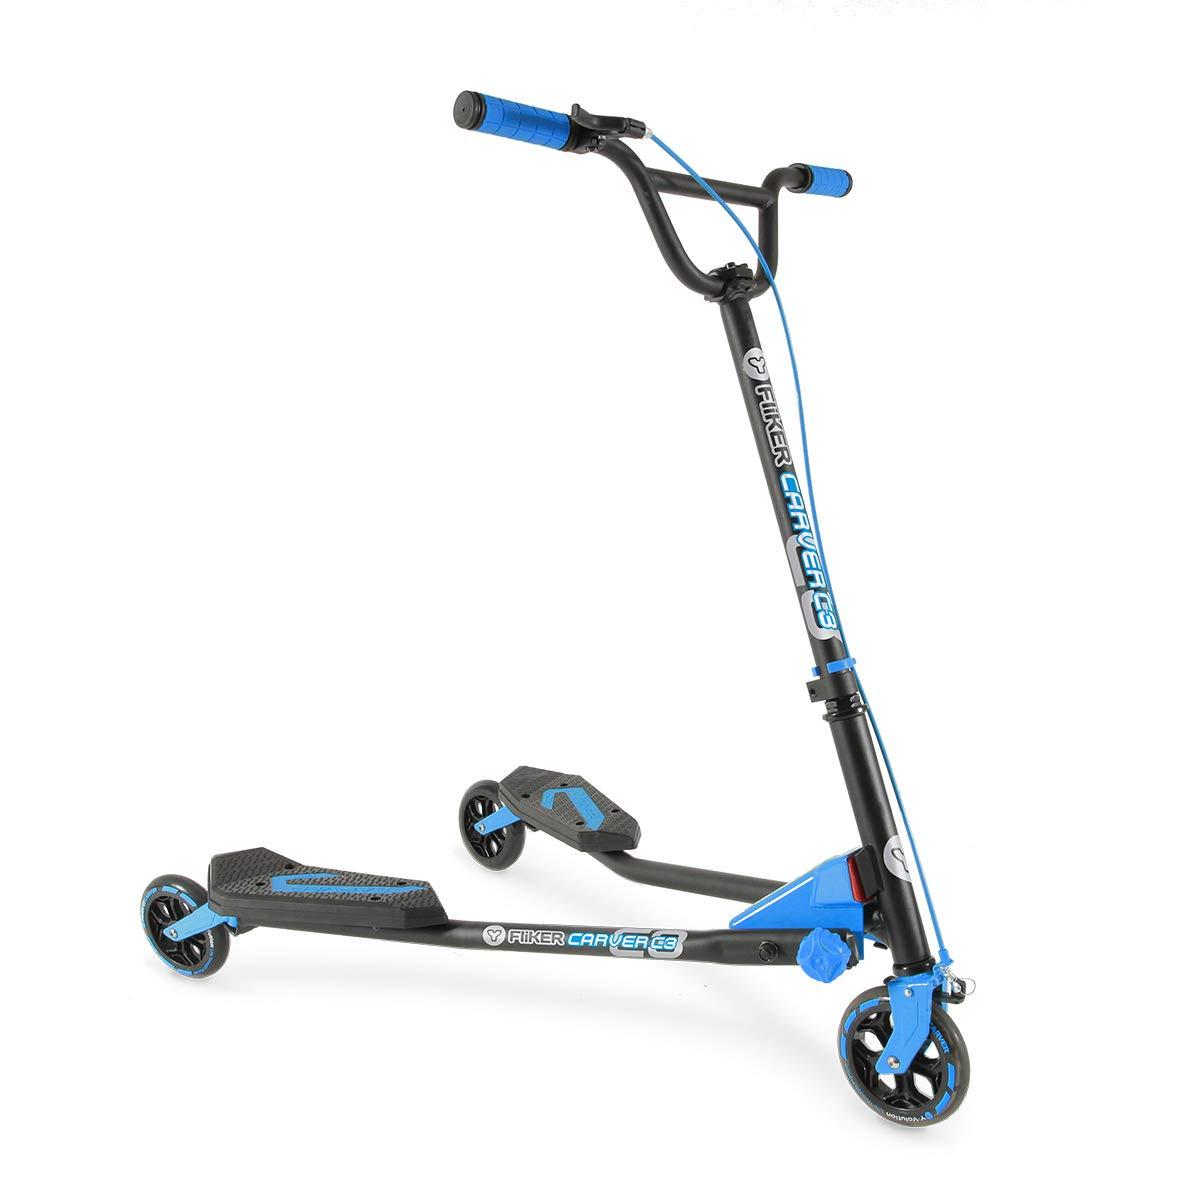 Y Fliker Scooter >> Amazon Com Yvolution Y Fliker C3 Scooter Blue One Size Flicker